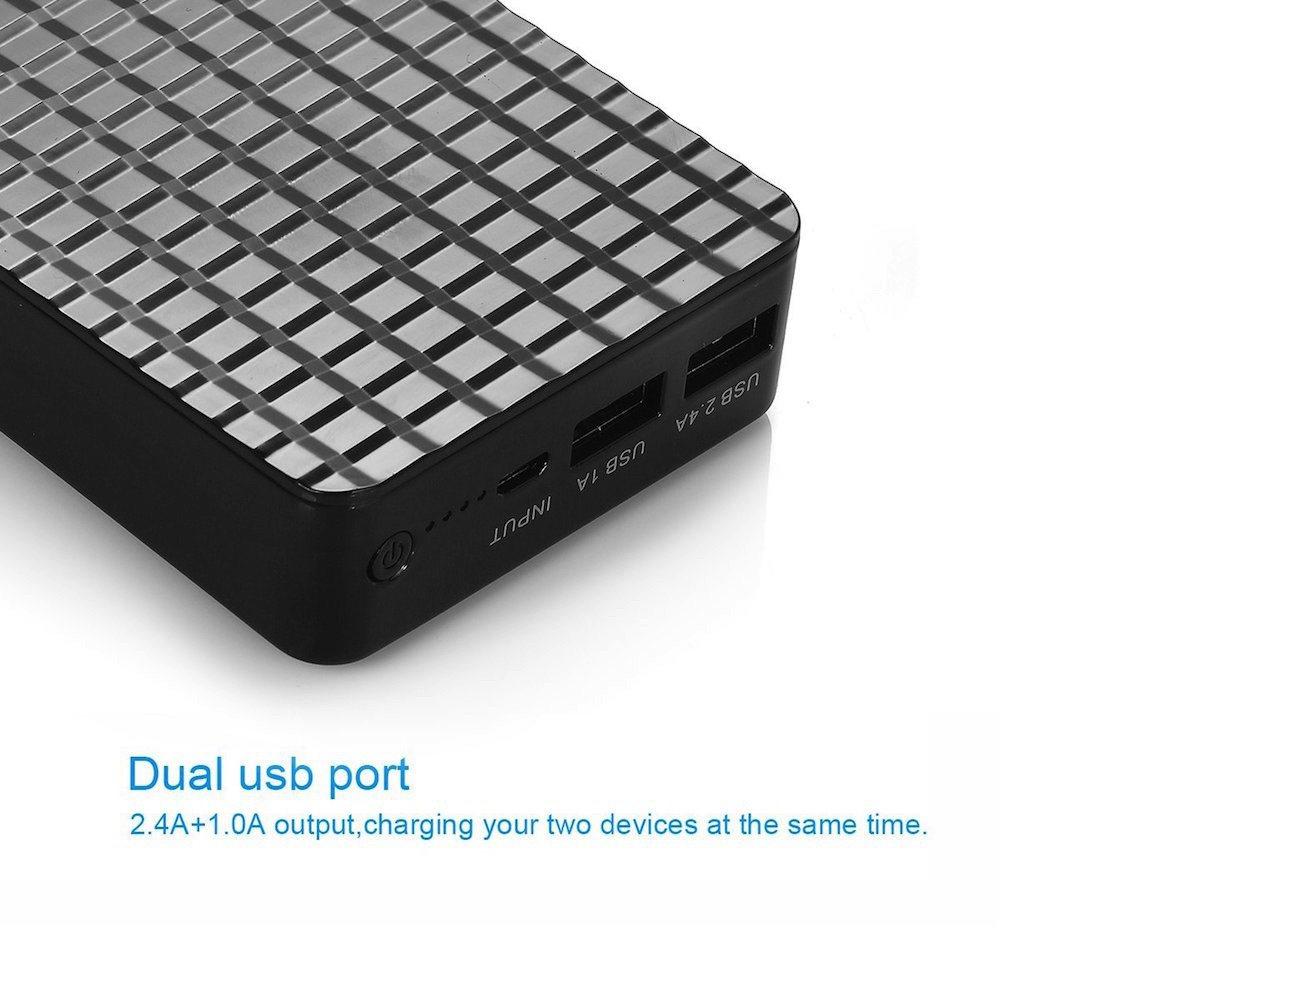 Poweradd™ Pilot Plus – High Capacity 20000mAh (2.4A+1.0A) Portable Charger